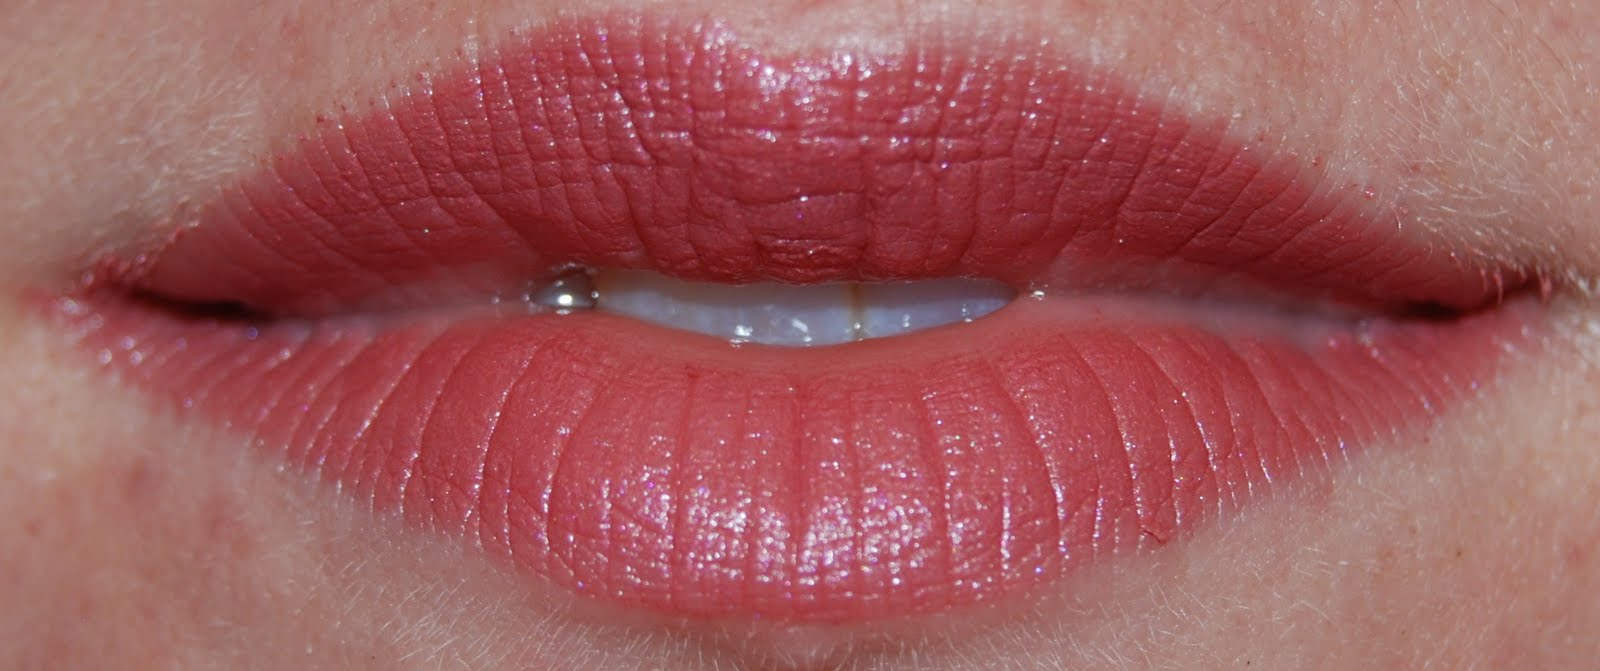 Revlon Mauve Lipstick Lip swatch  blushing mauveRevlon Mystic Mauve Lipstick